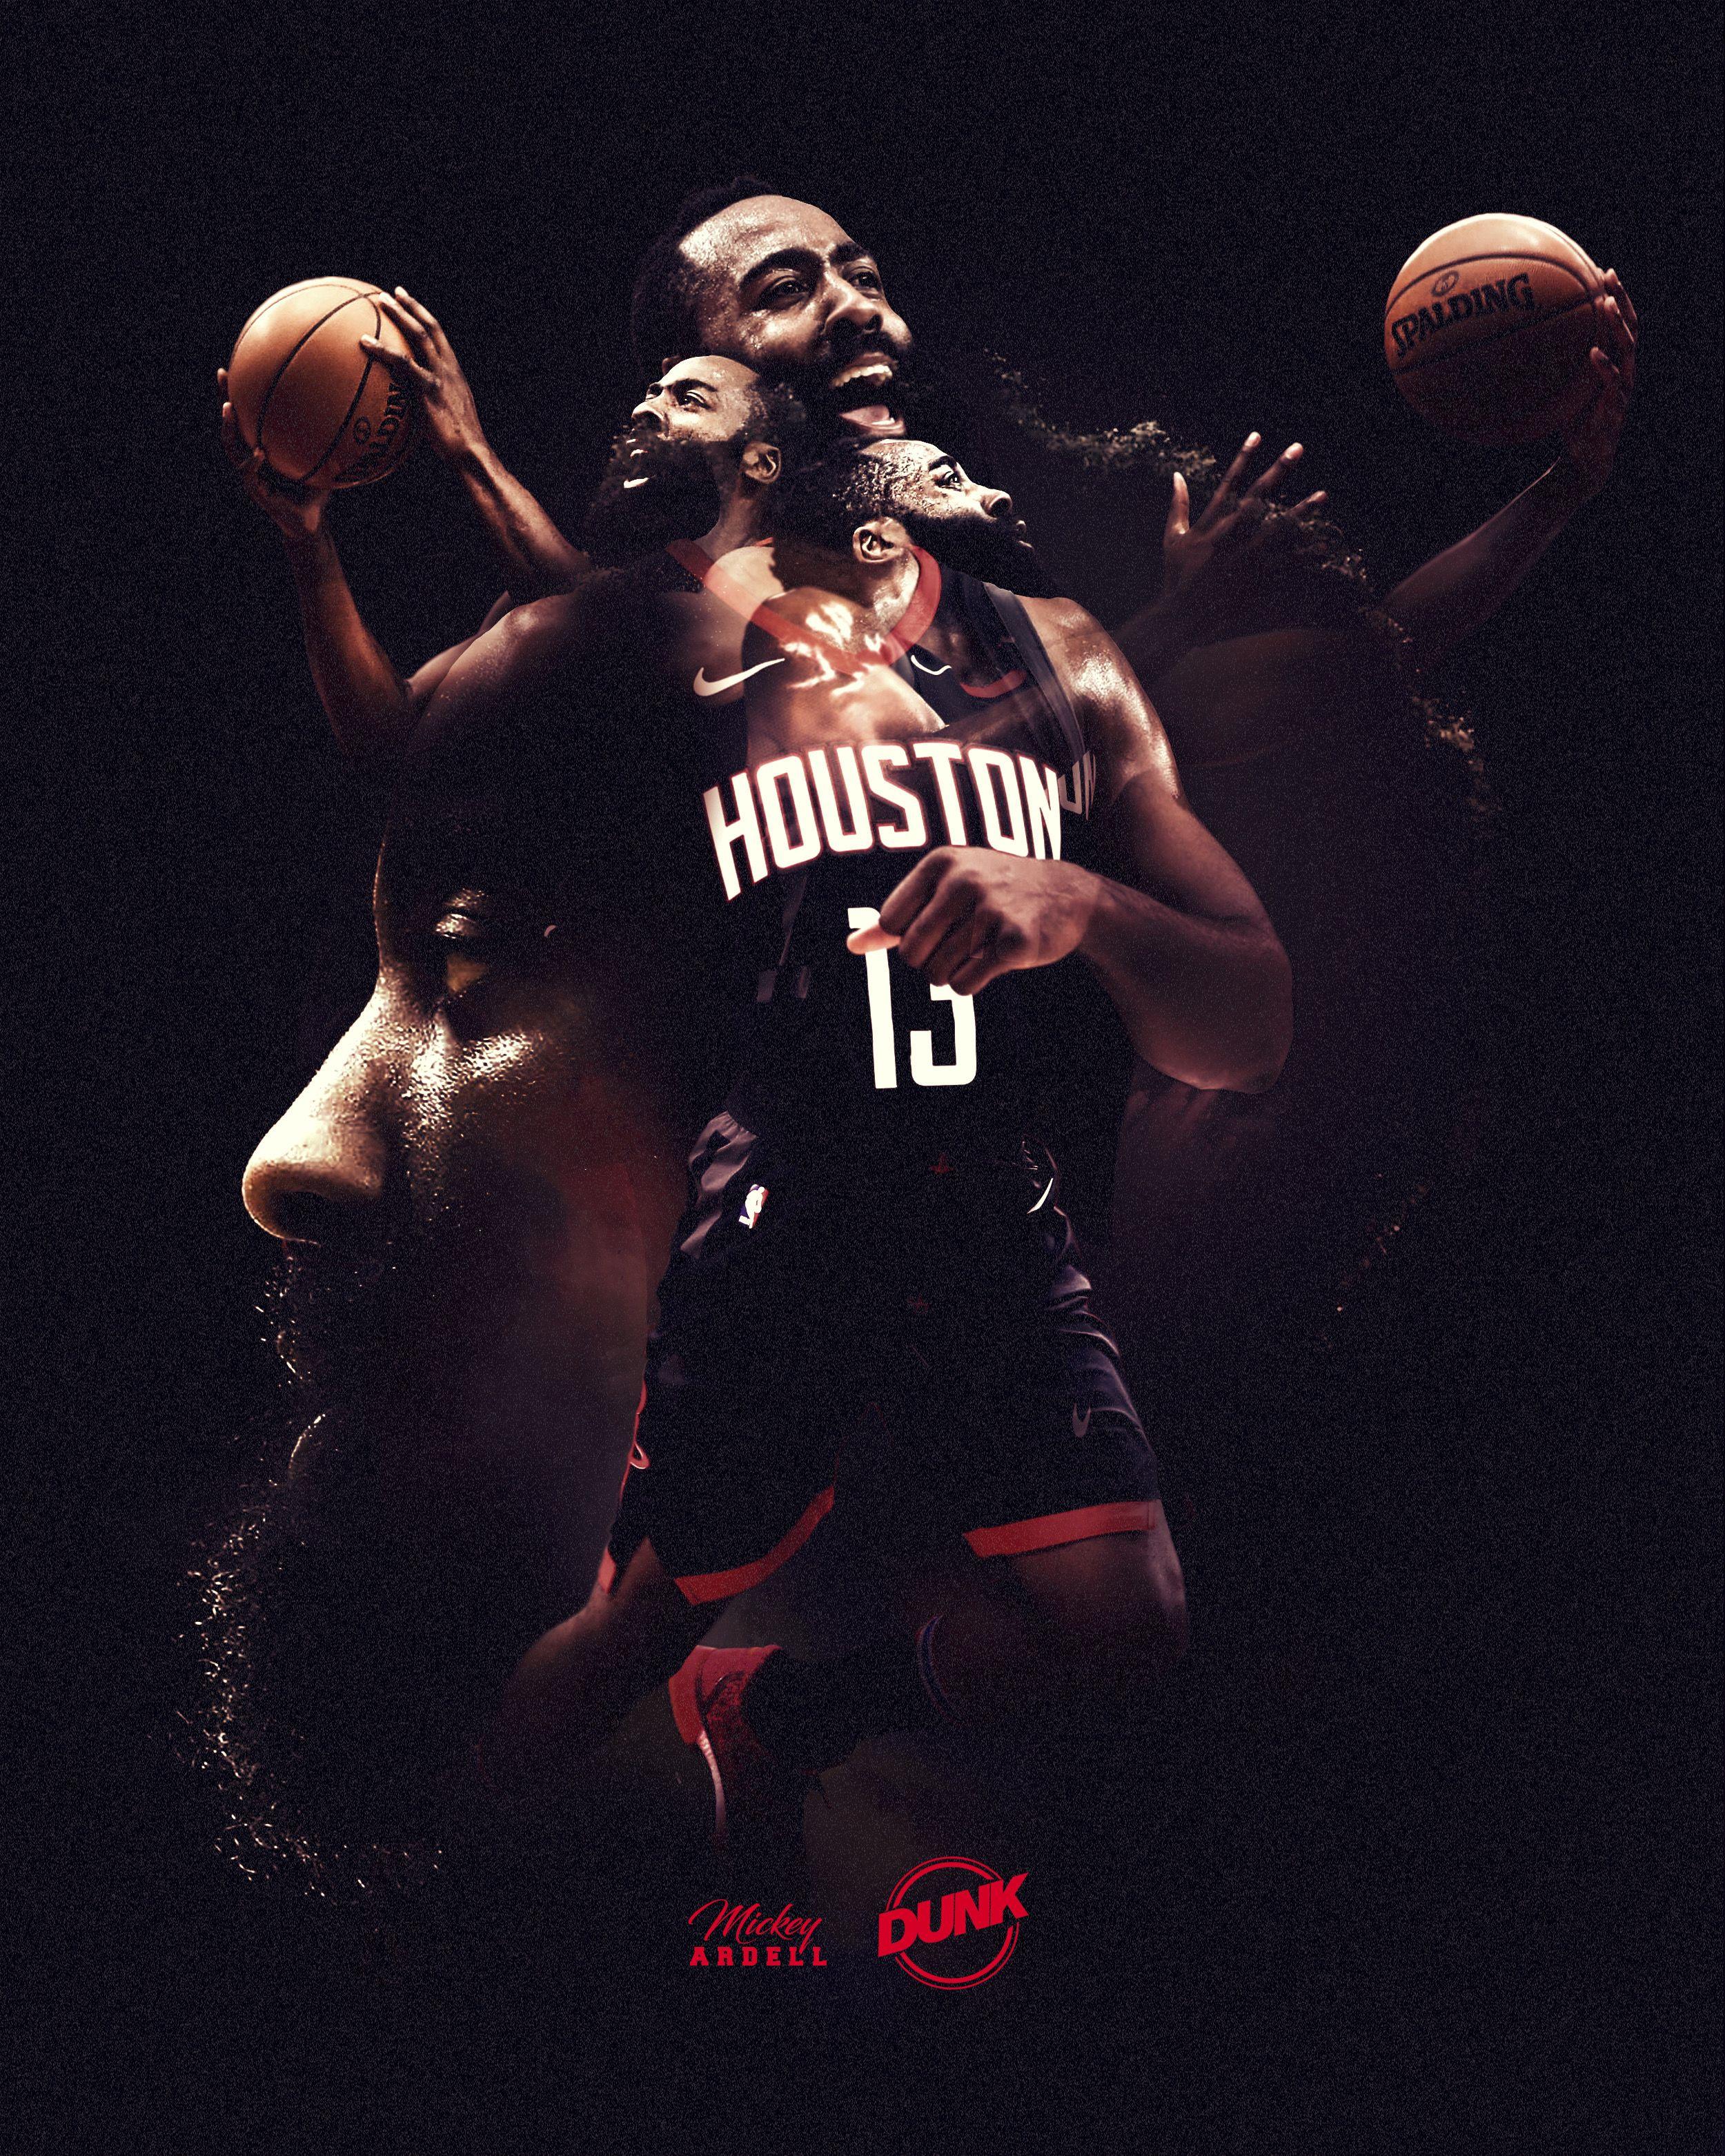 James Harden x Houston Powered by Dunk. Designer Mickey